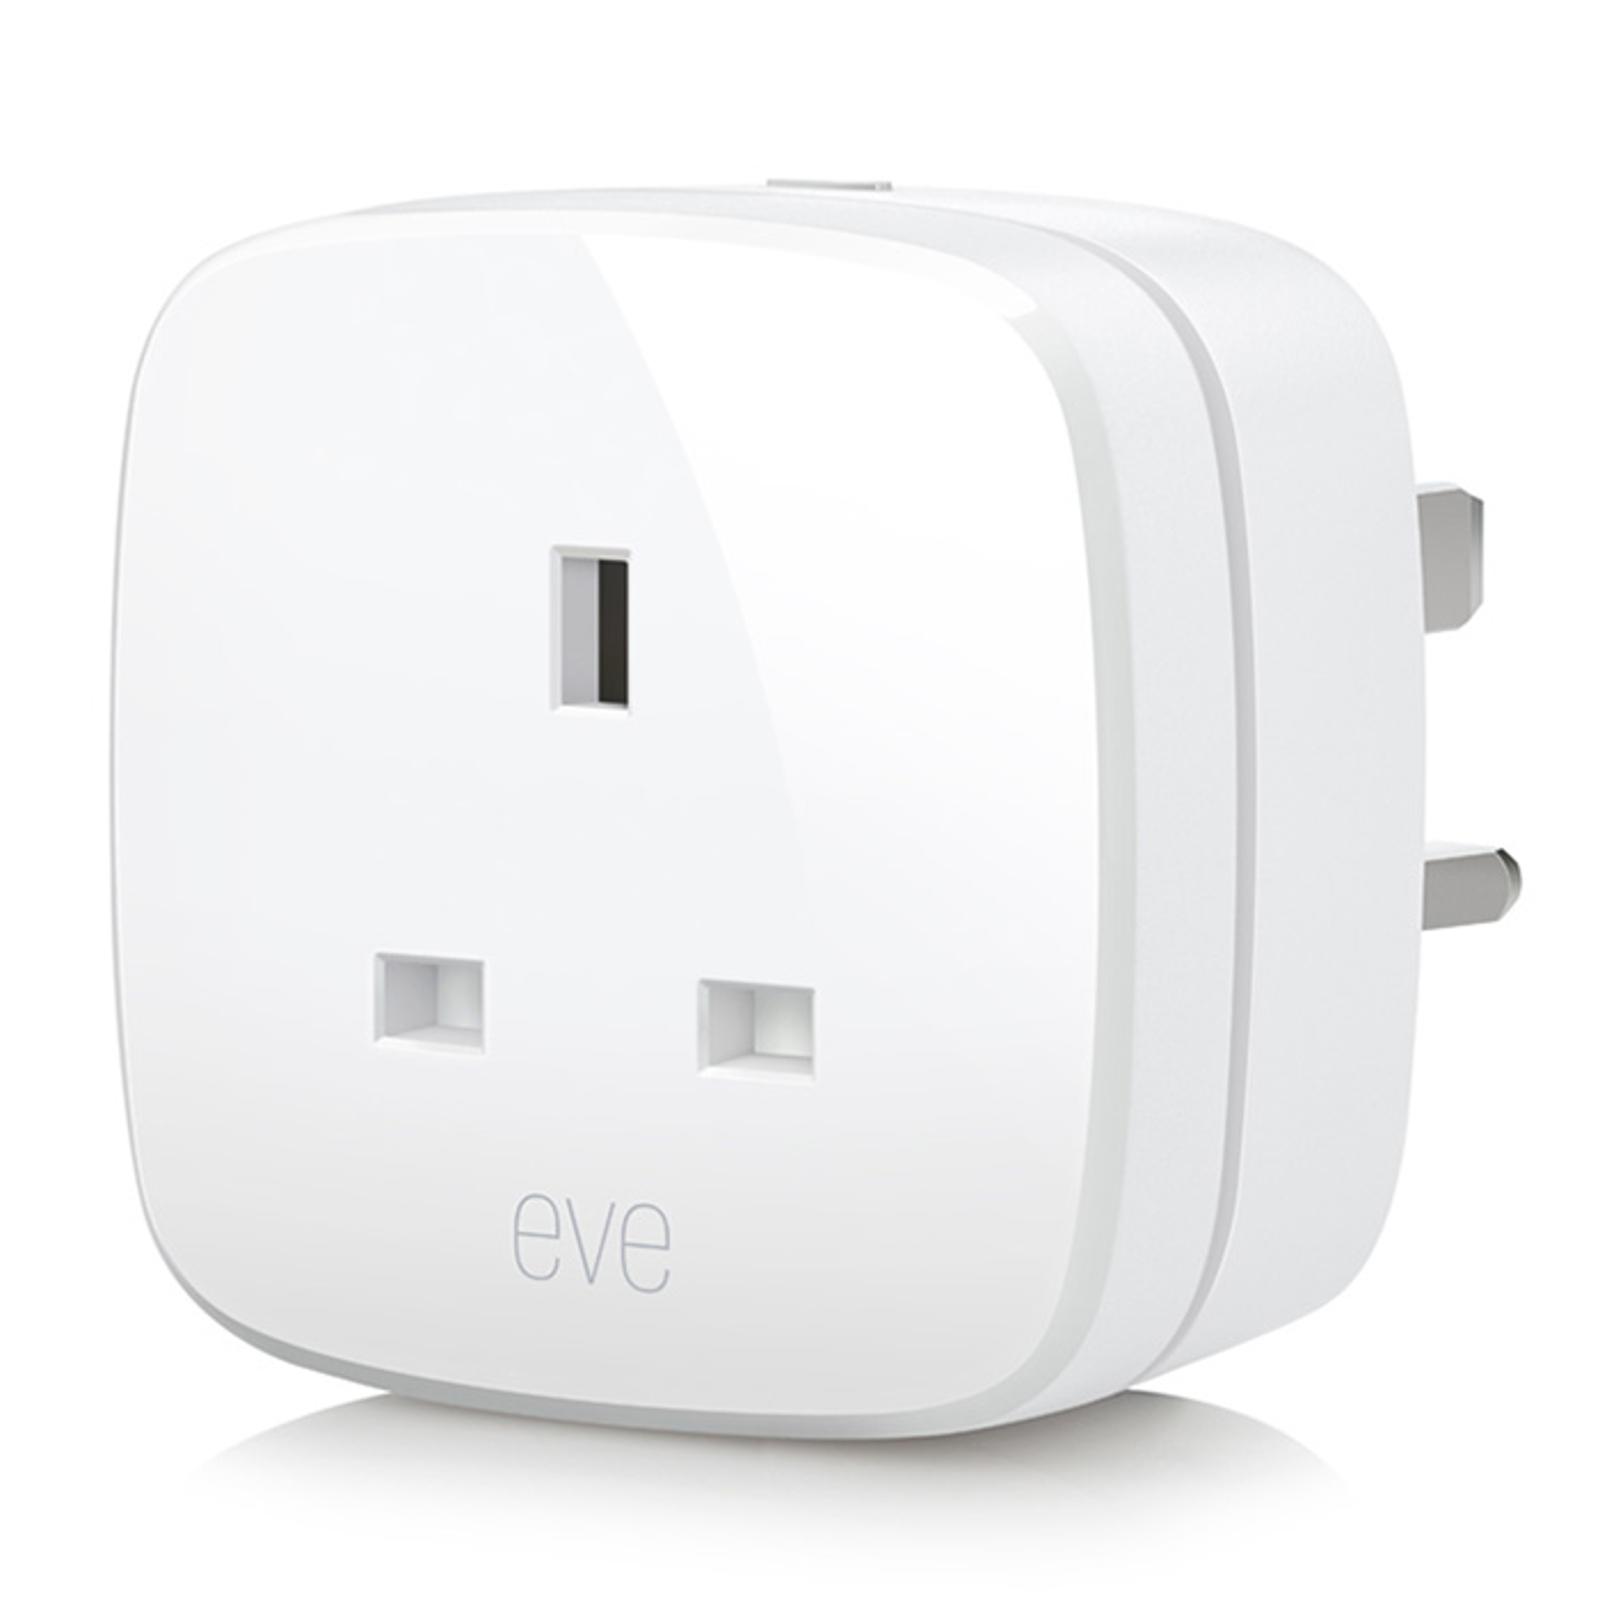 Eve Energy Smart Home power point UK_2029003_1